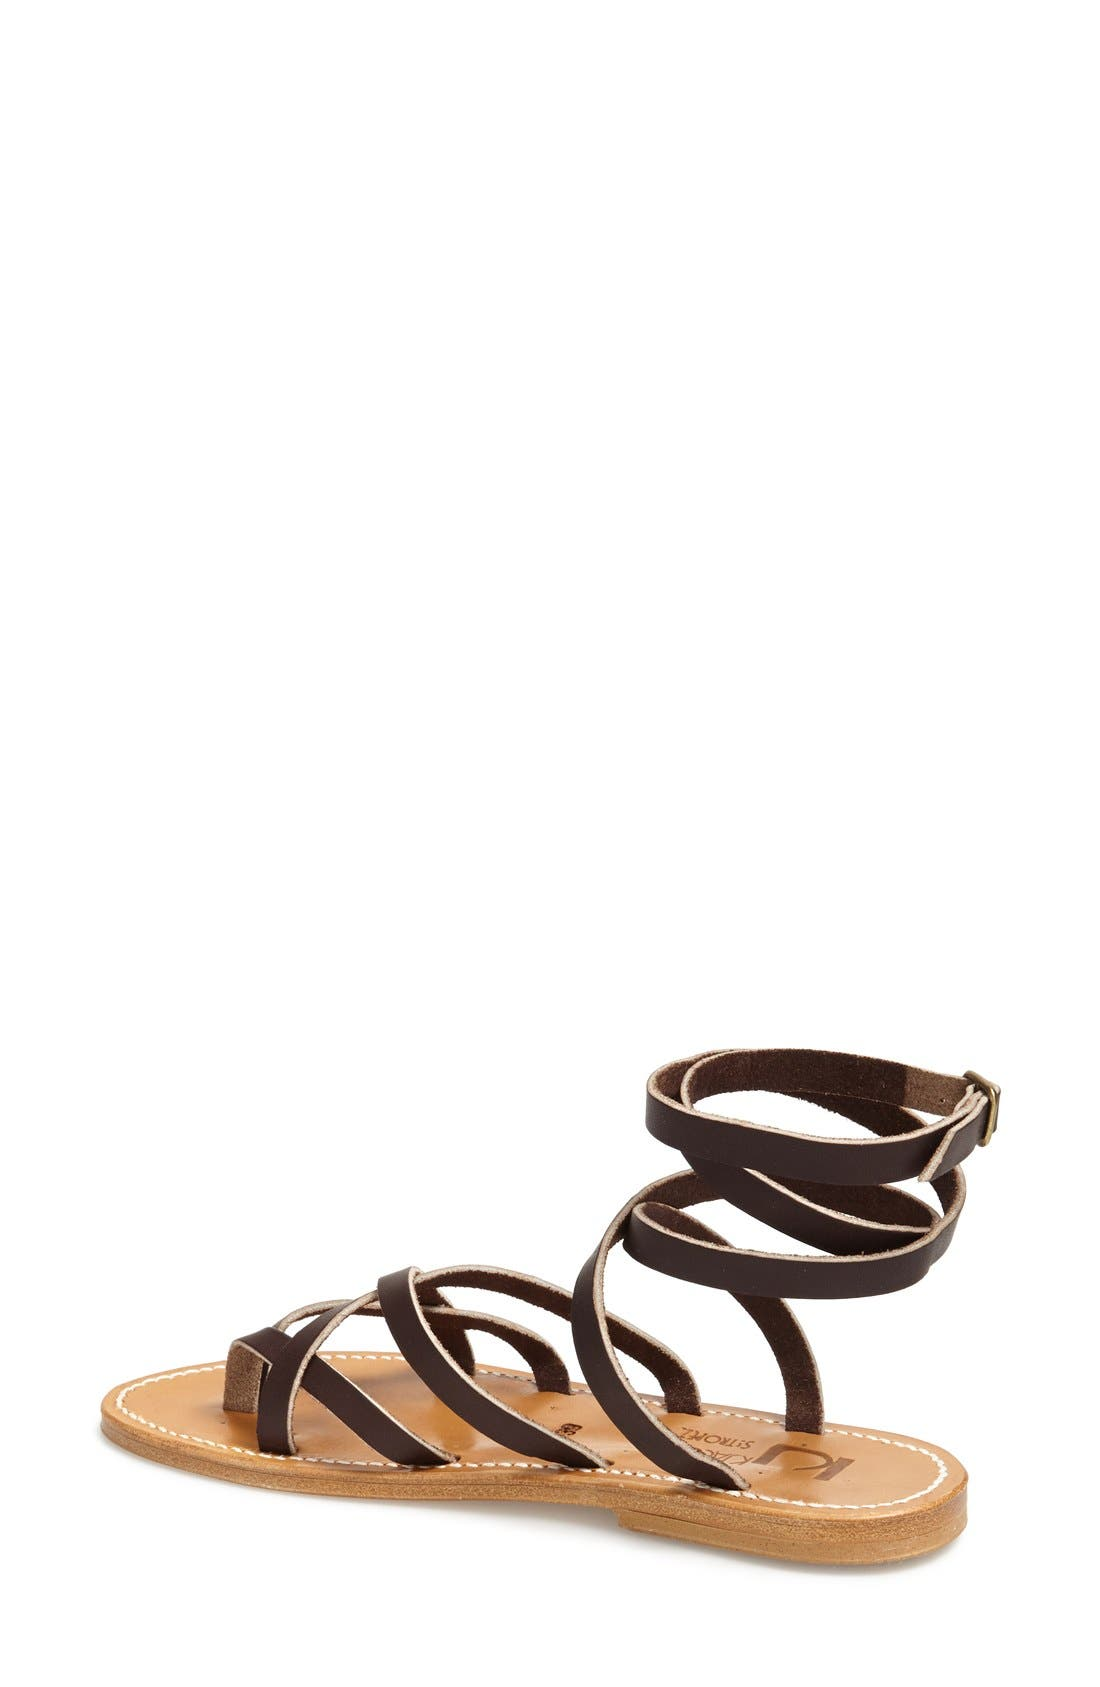 Alternate Image 2  - K.Jacques St. Tropez 'Zenobie' Ankle Wrap Sandal (Women)